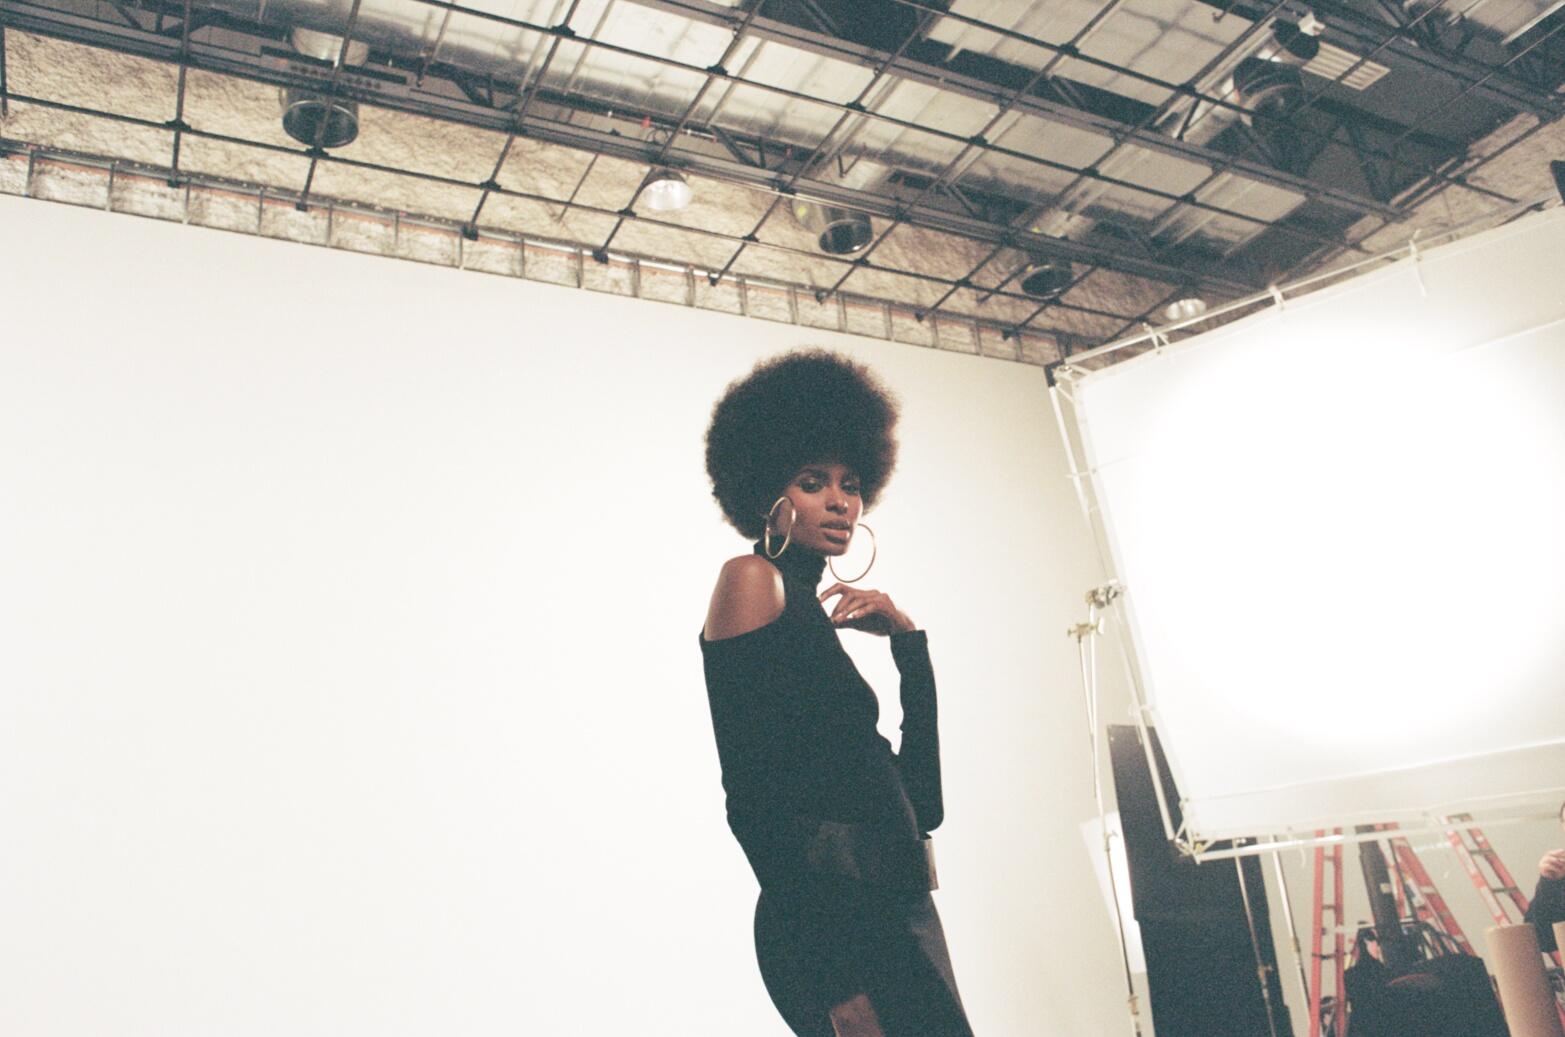 Tierra Benton on set with Pantene and Pulse Films - Film Photo by Nicole Ortero